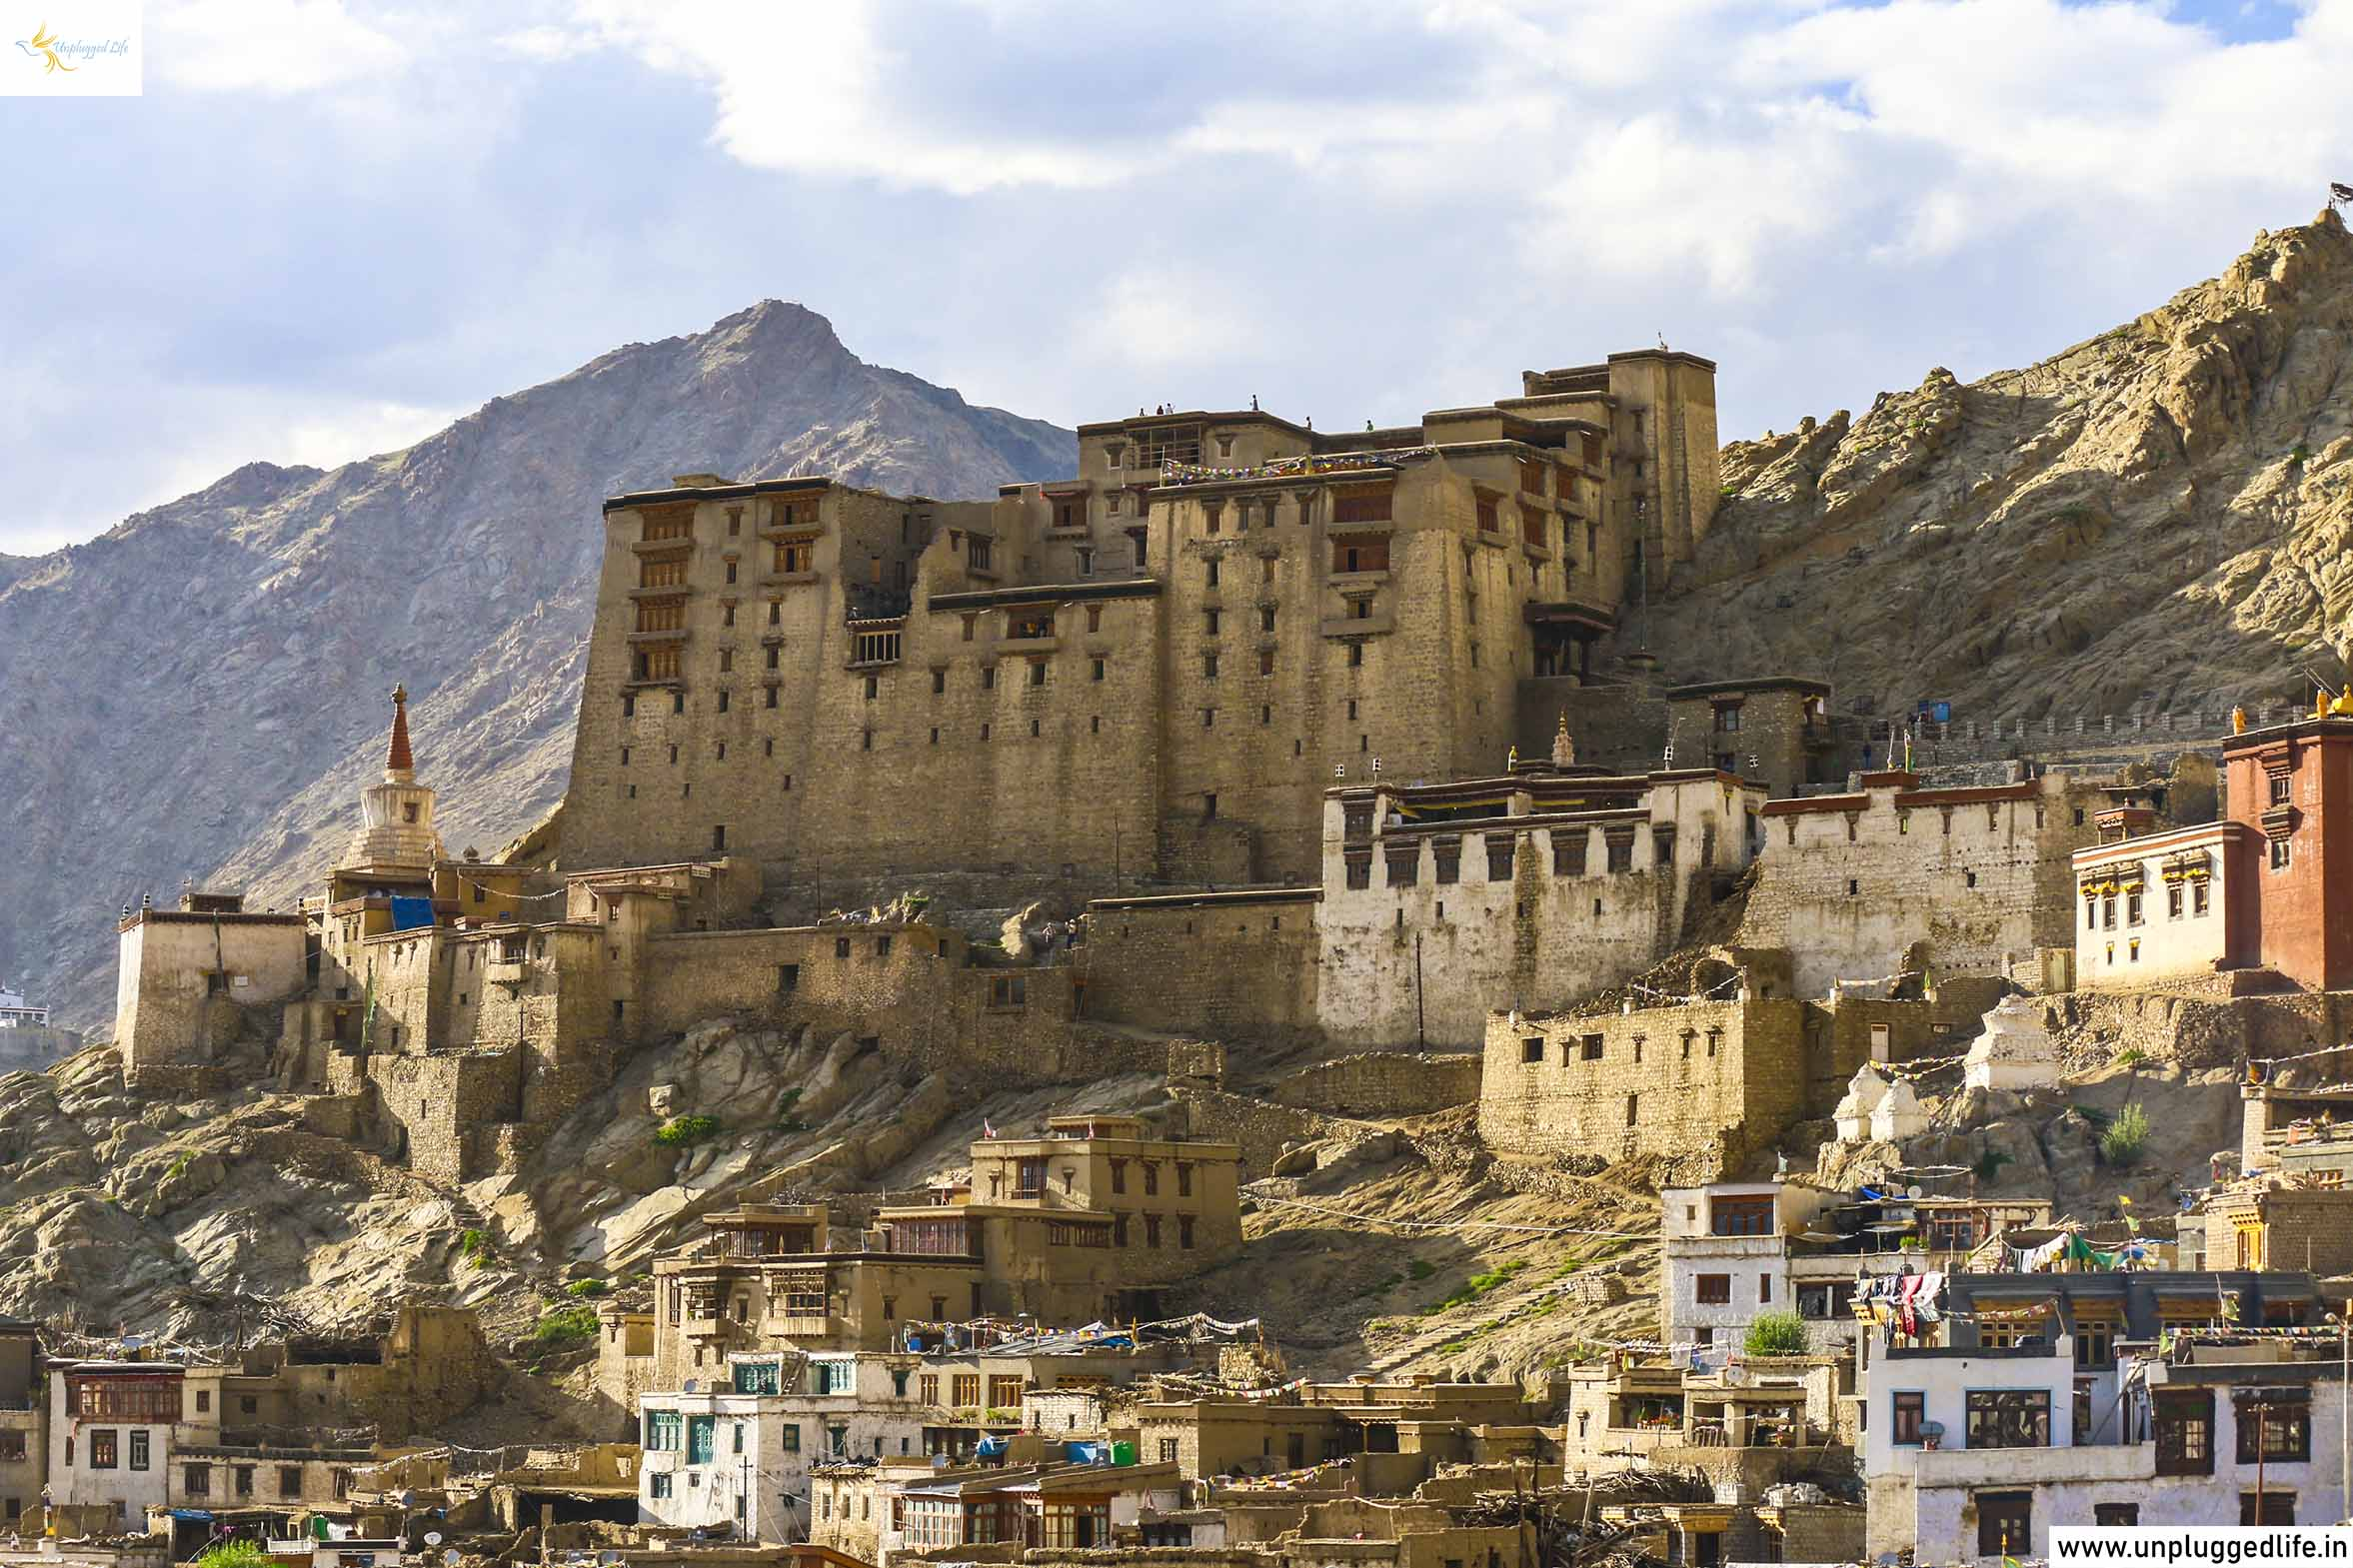 Unplugged Life, Himalayas, Ladakh, Leh View, View of Ladakh, View from Shanti Stupa, Mountain View, Leh Ladakh Sightseeing Tour, Leh Ladakh Package, Book Ladakh Trip, Sunset Point, Leh Palace